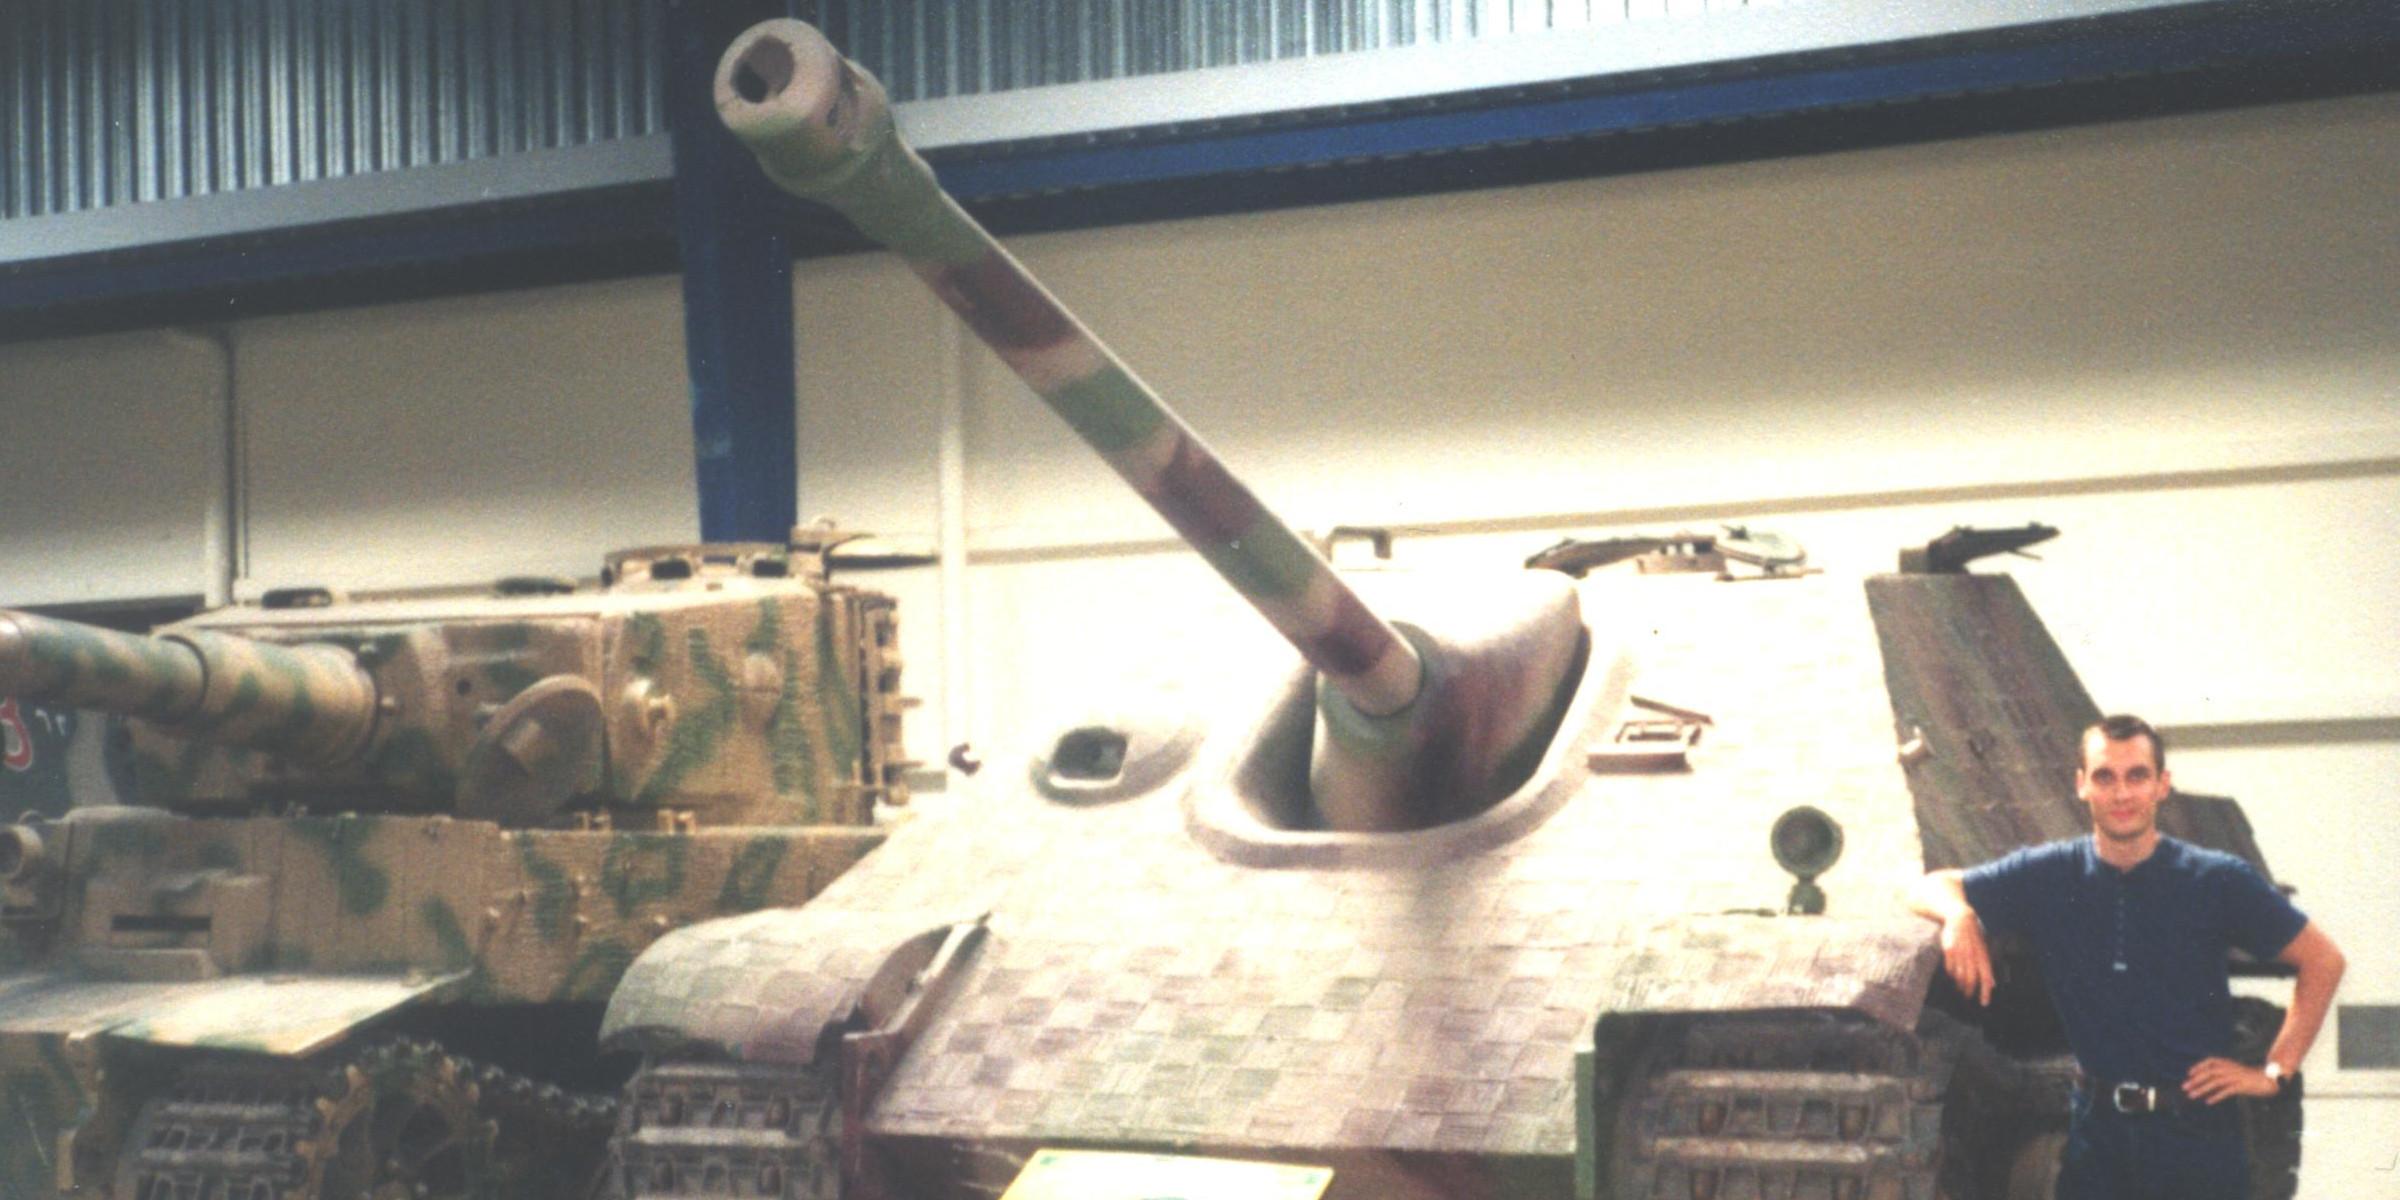 Piterpanzer w Muzeum Broni Pancernej w Saumur